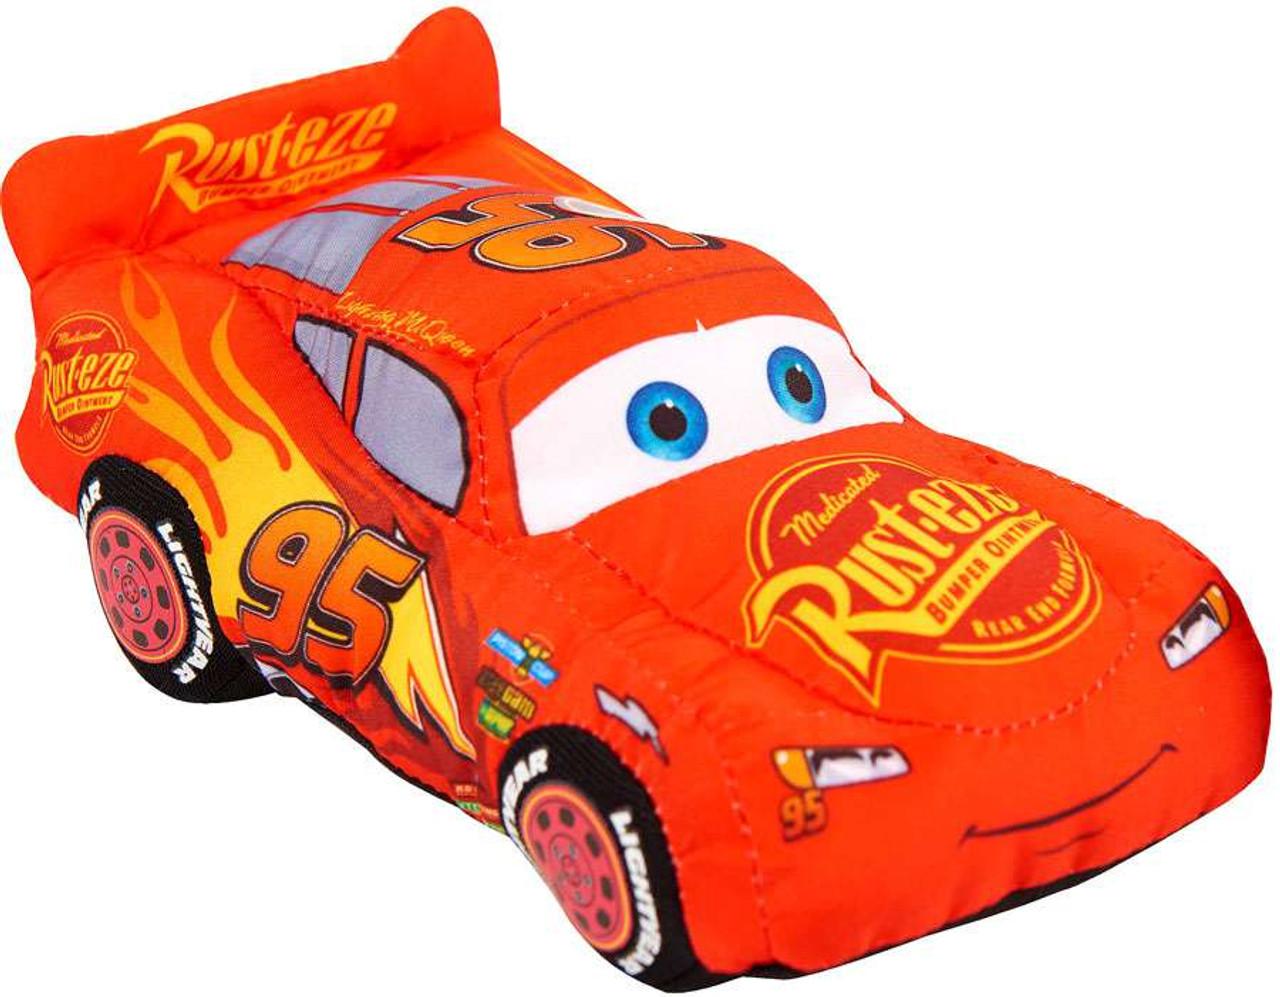 Disney Pixar Cars Cars 3 Lightning Mcqueen Plush With Sound Just